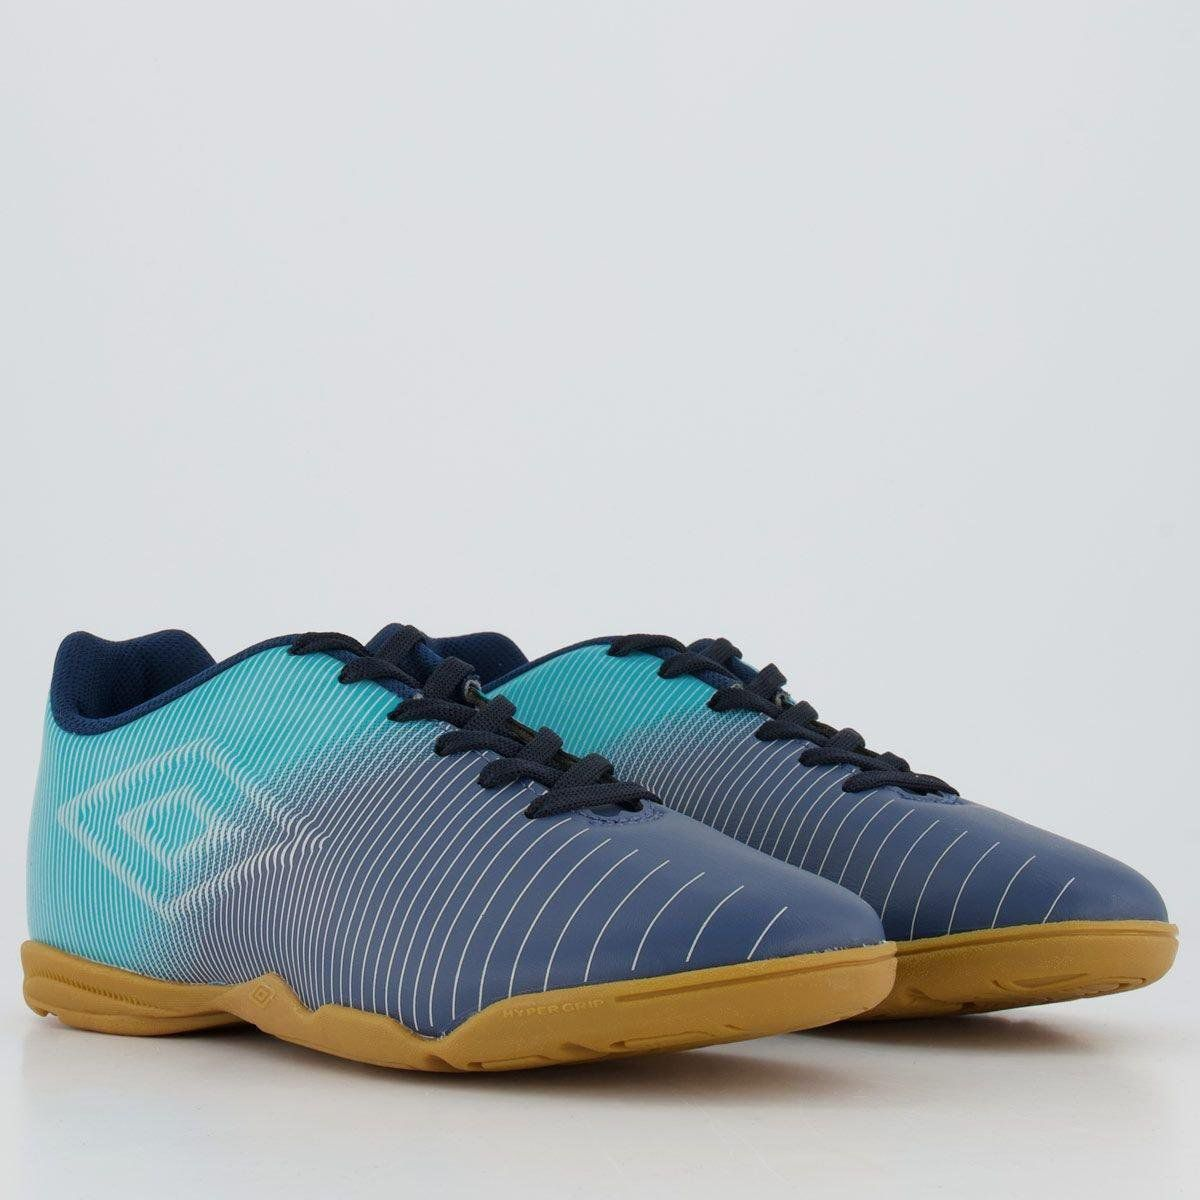 Chuteira Adulto Umbro Vibe Futsal - Mar / Azul